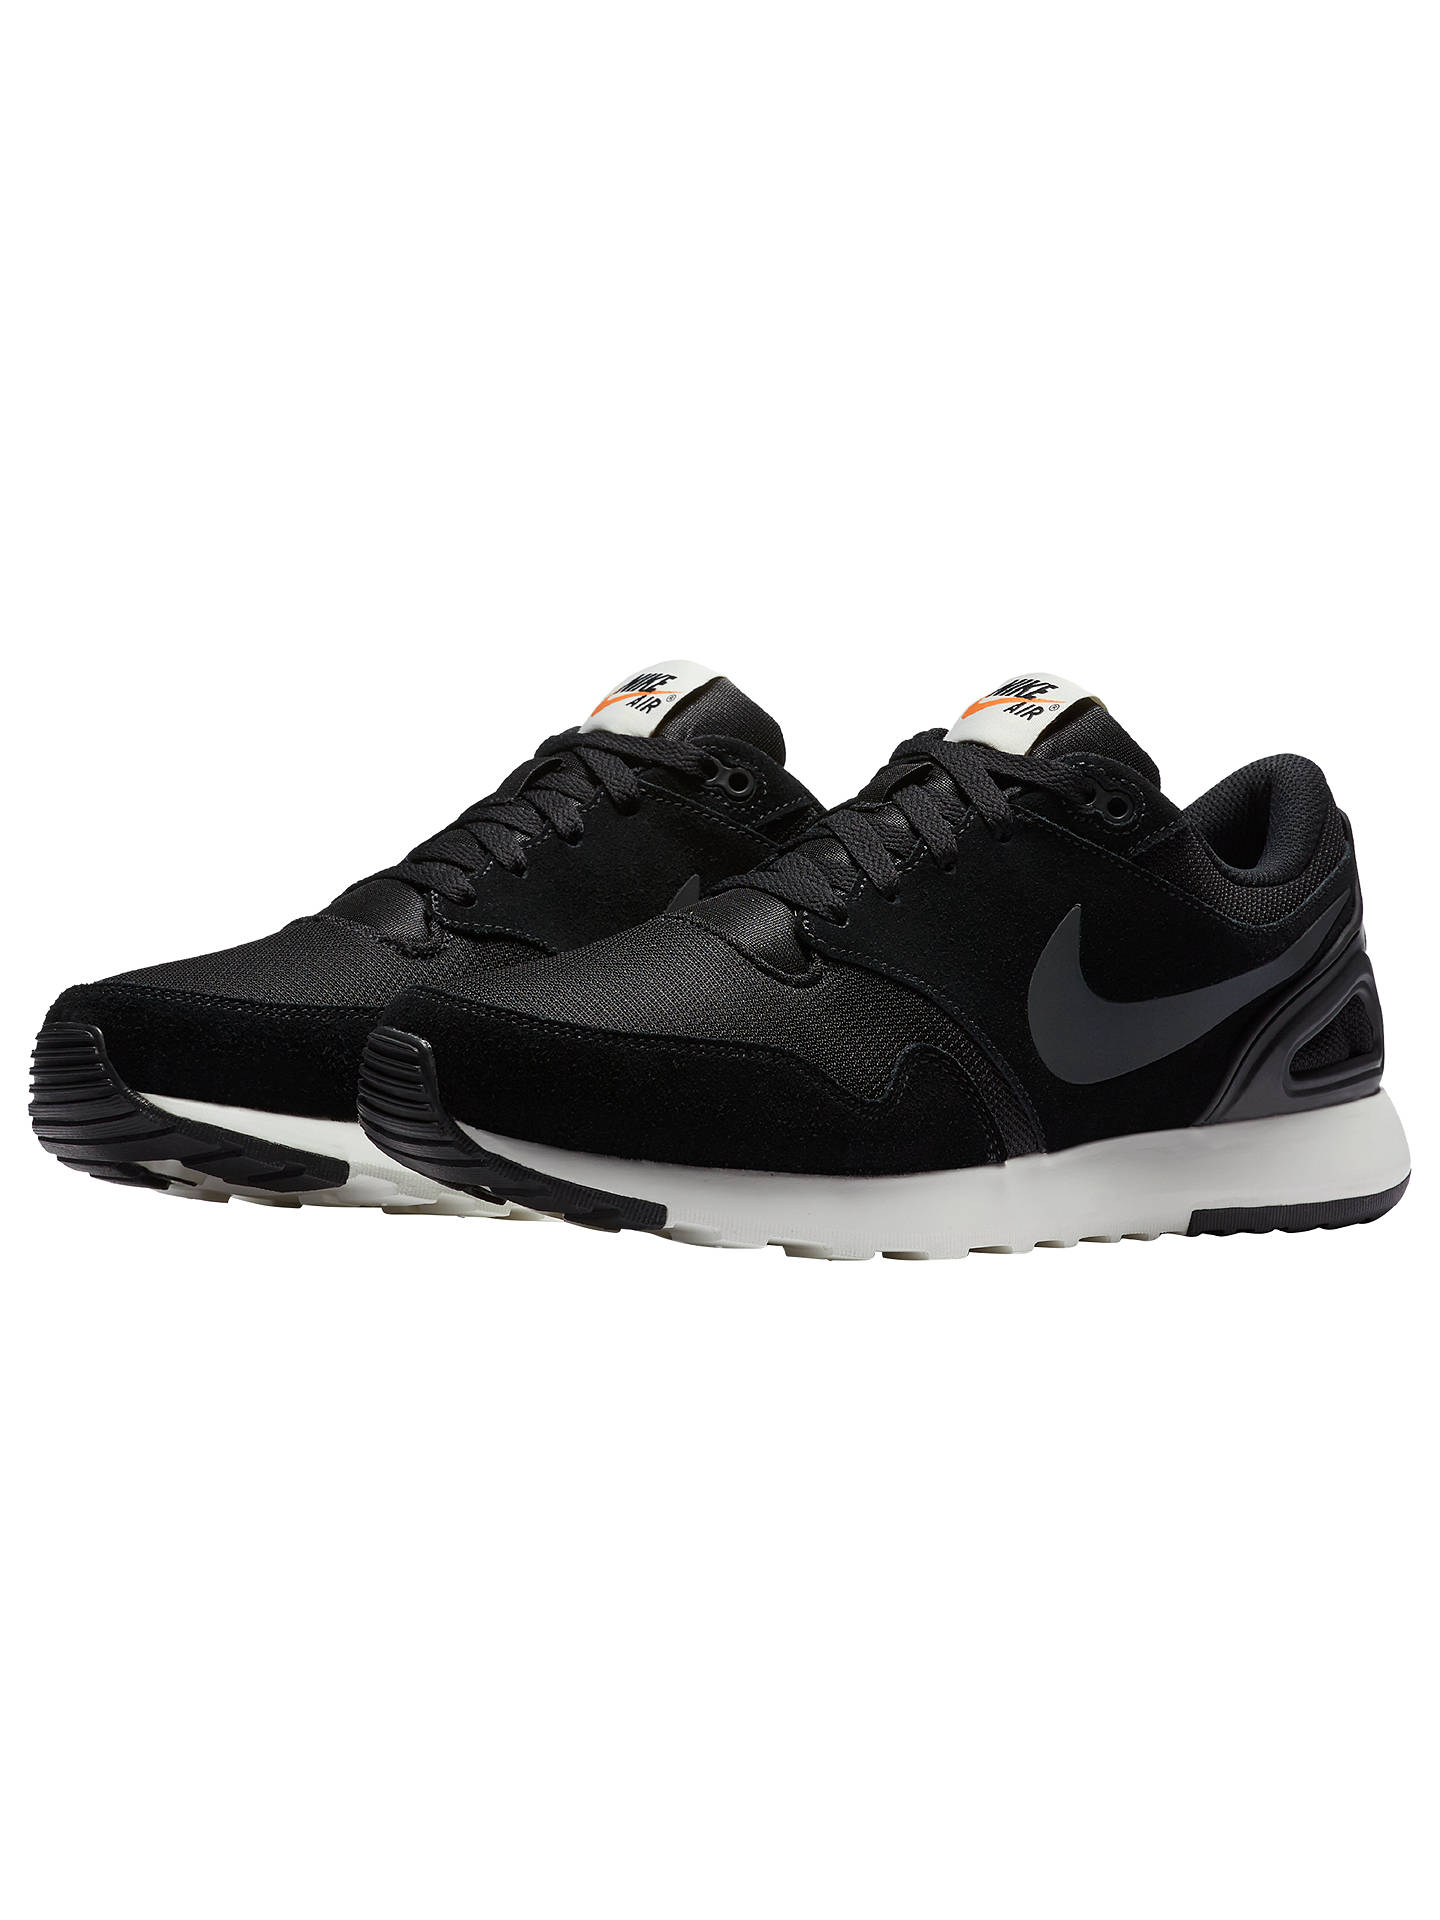 sports shoes 01882 9b59e best price nike air vibenna mens green j1857 57c3f d5fad  canada buynike air  vibenna mens trainers blackwhite 12 online at ab854 69a20